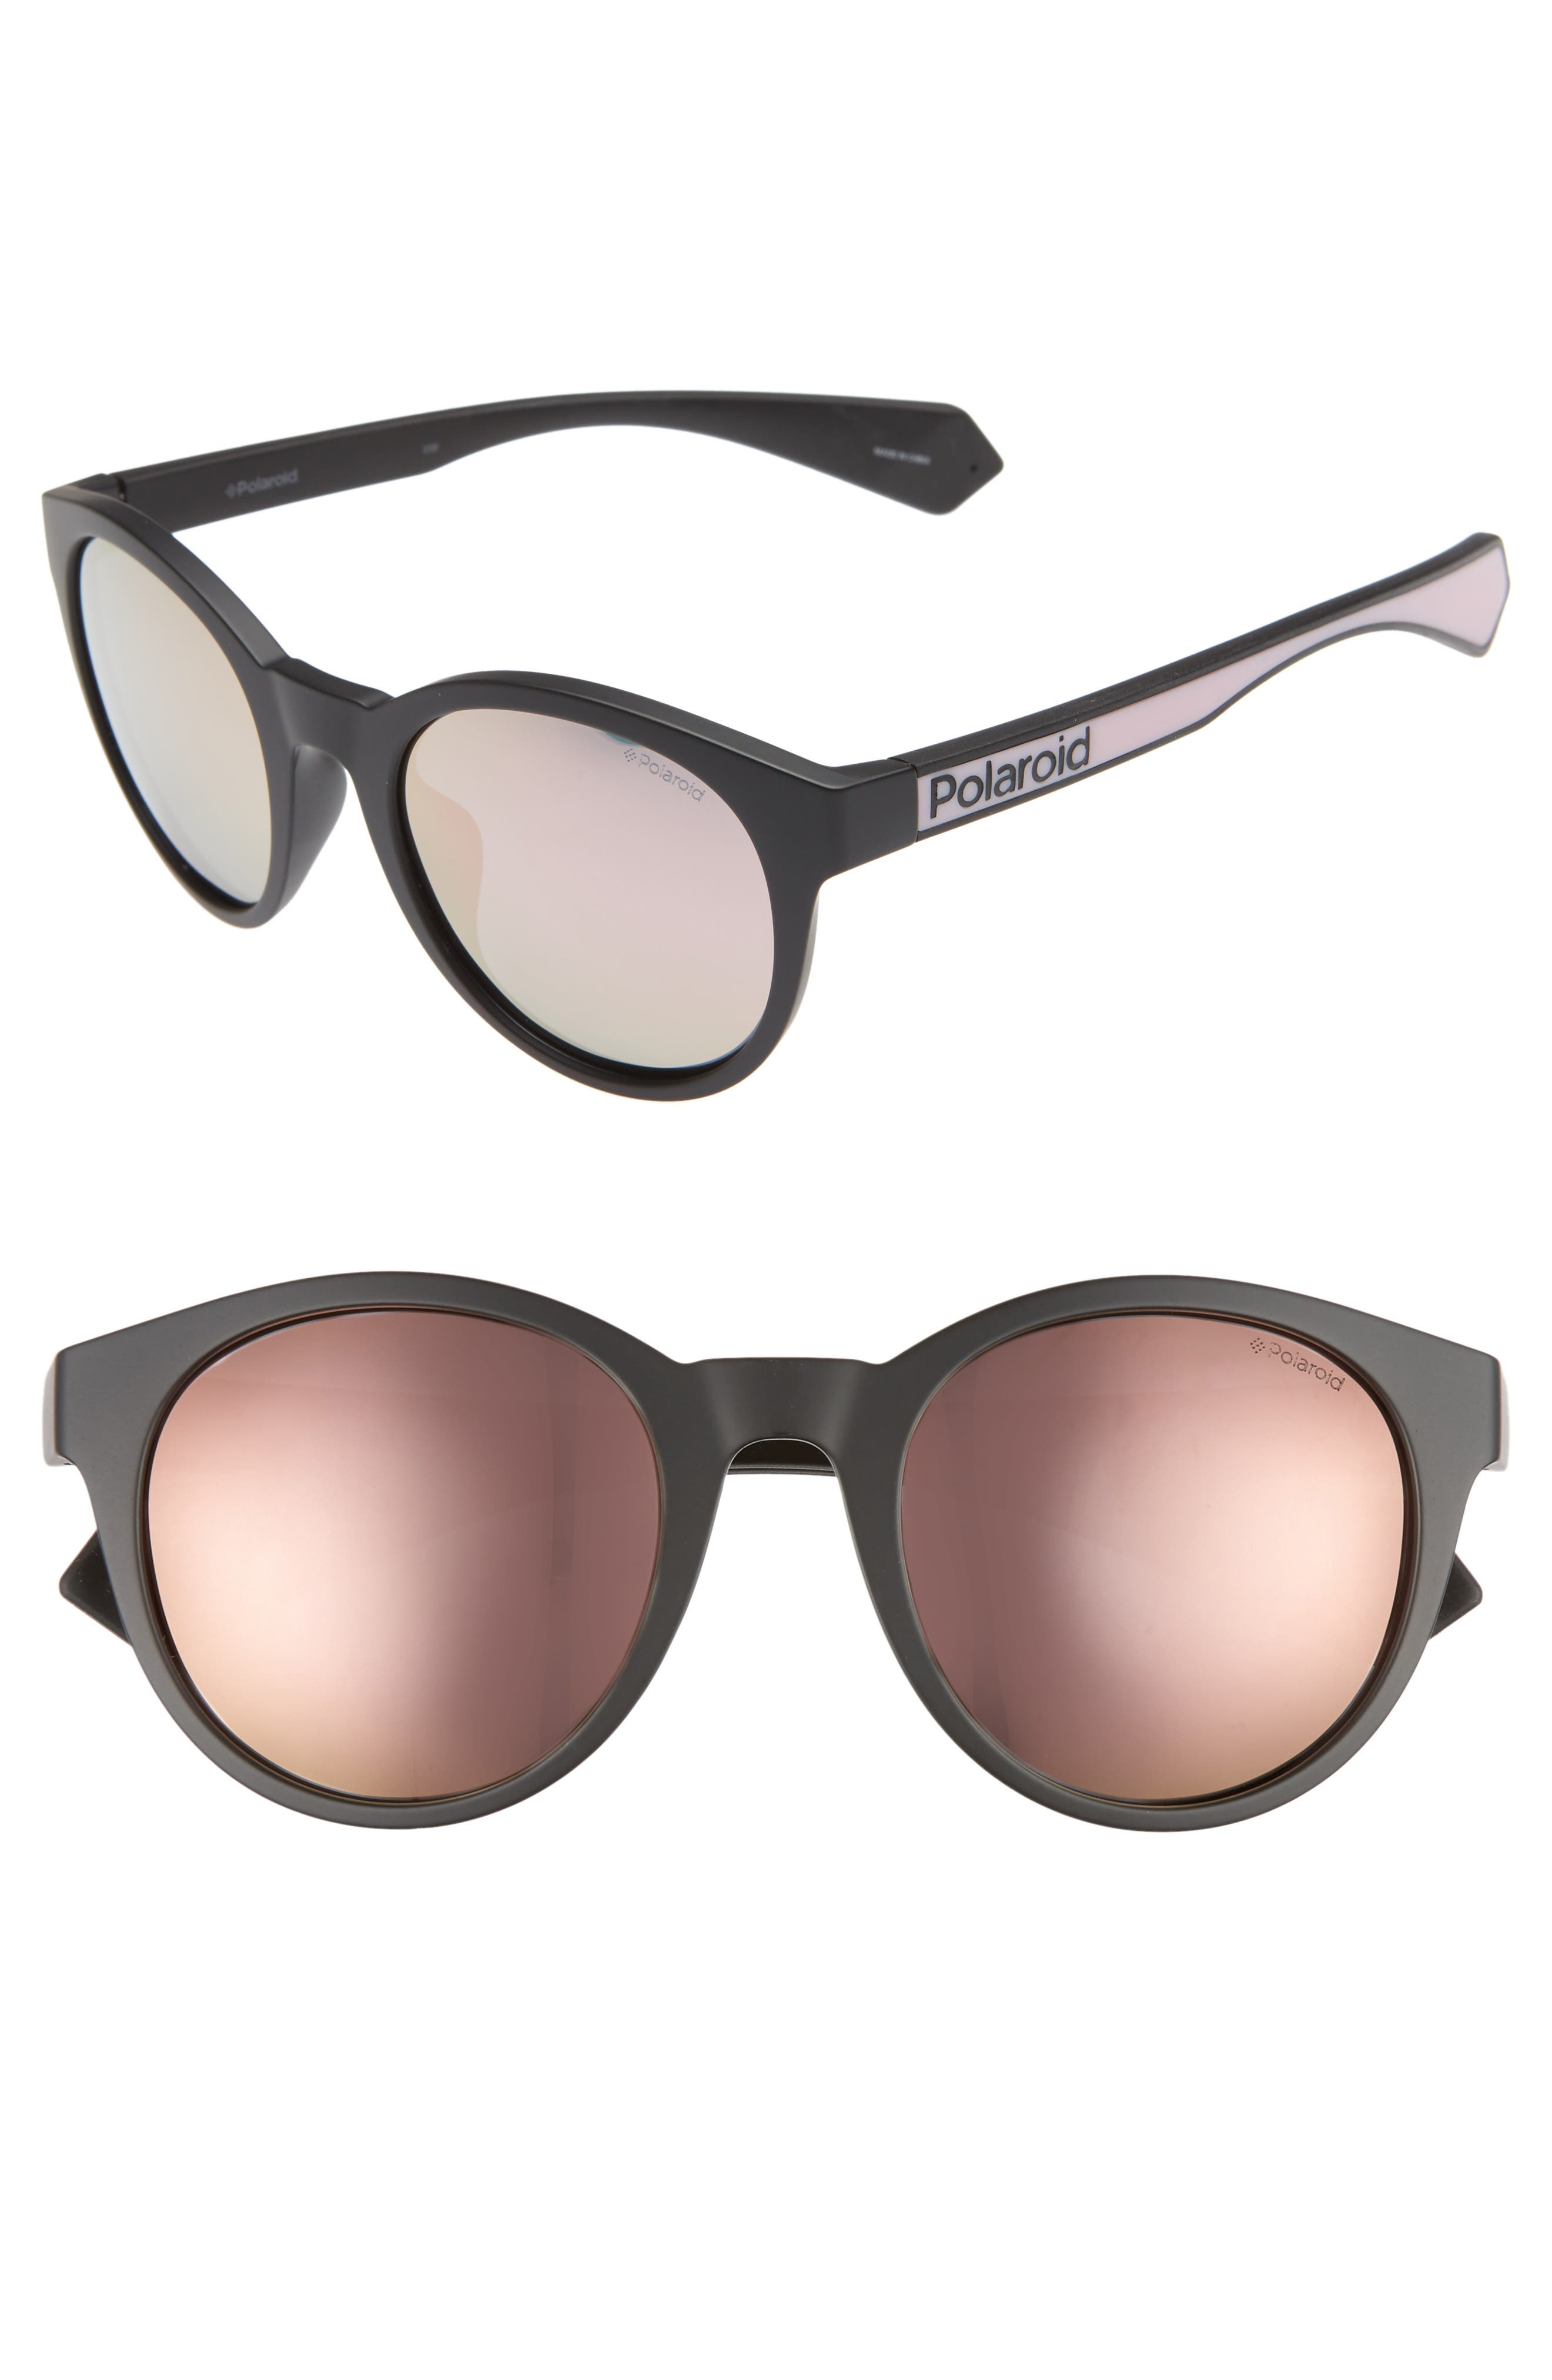 Polaroid 52Mm Polarized Mirrored Round Sunglasses -